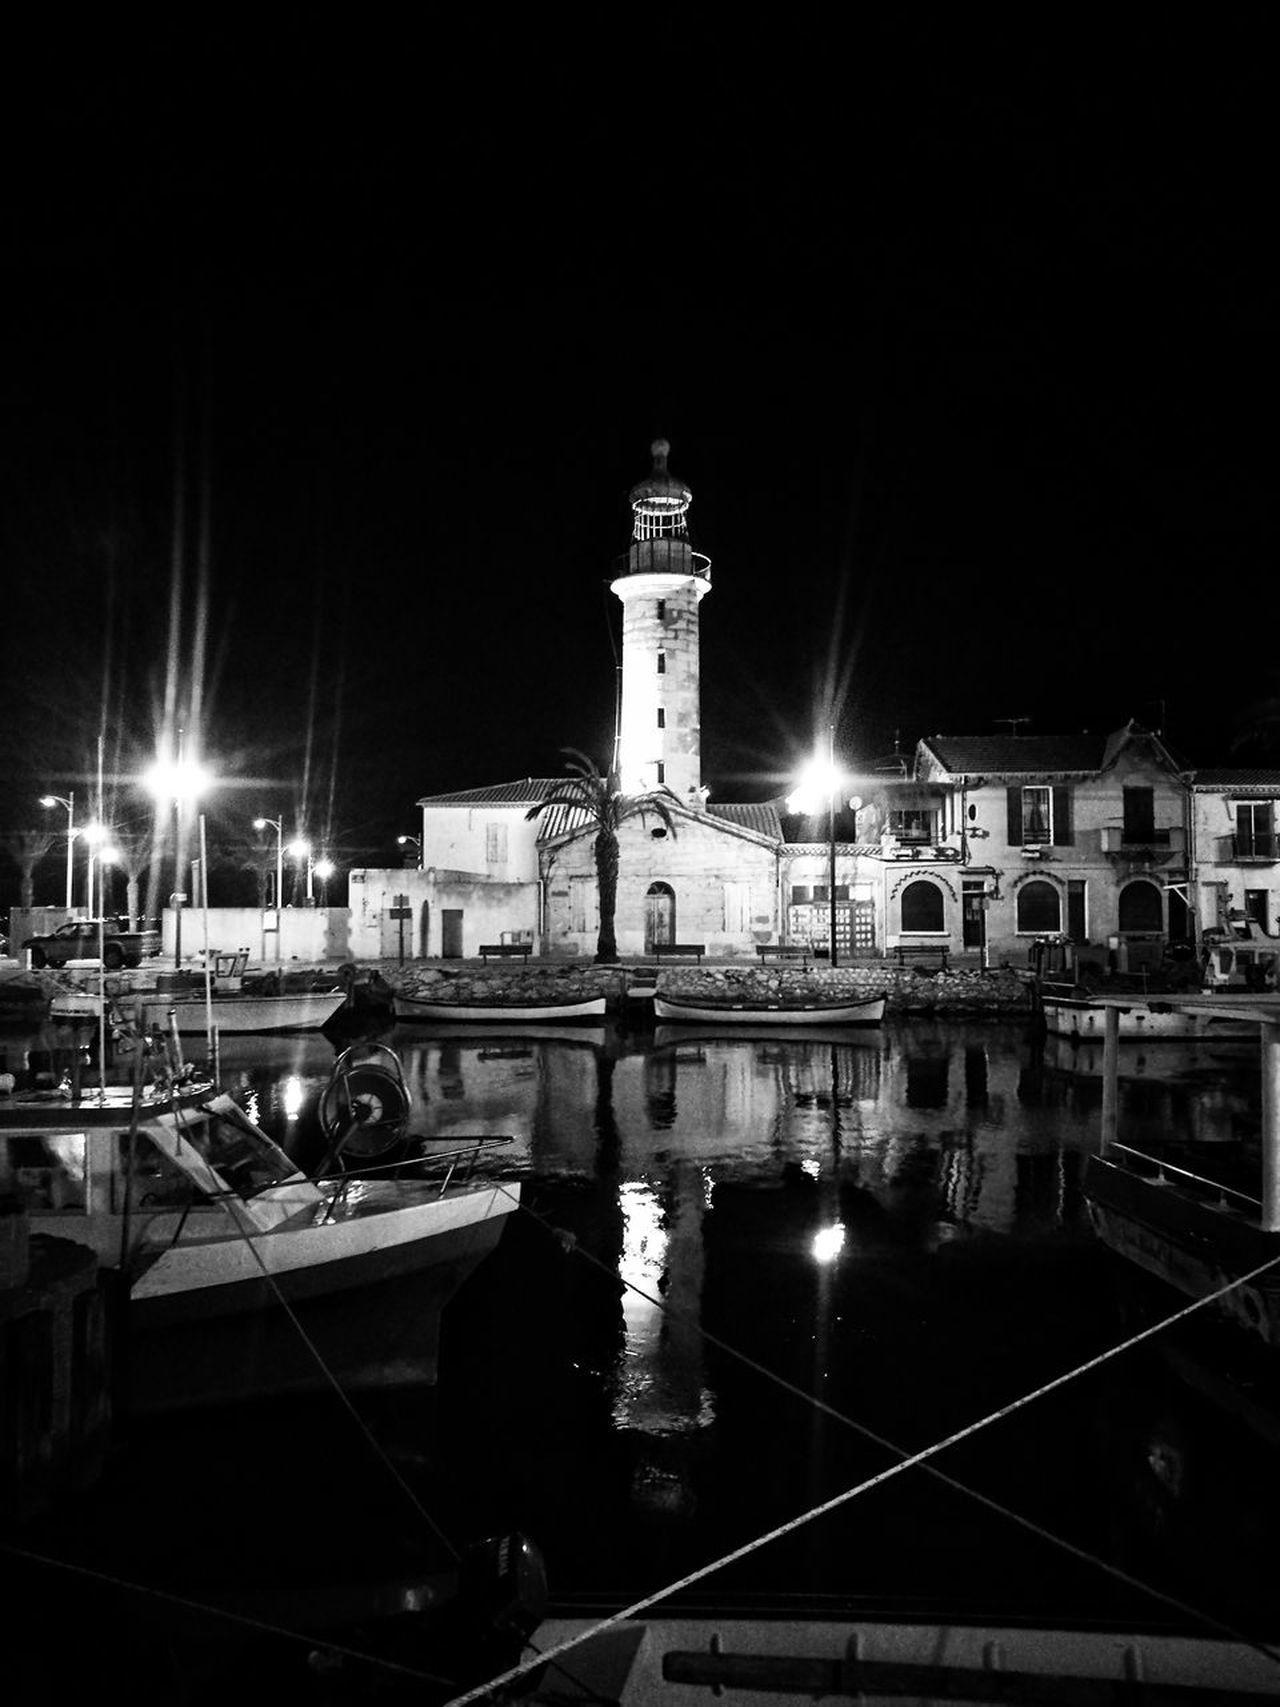 Night Illuminated Reflection Architecture Boat Dock Fishing Port Sea Travel Destinations Grau Du Roi